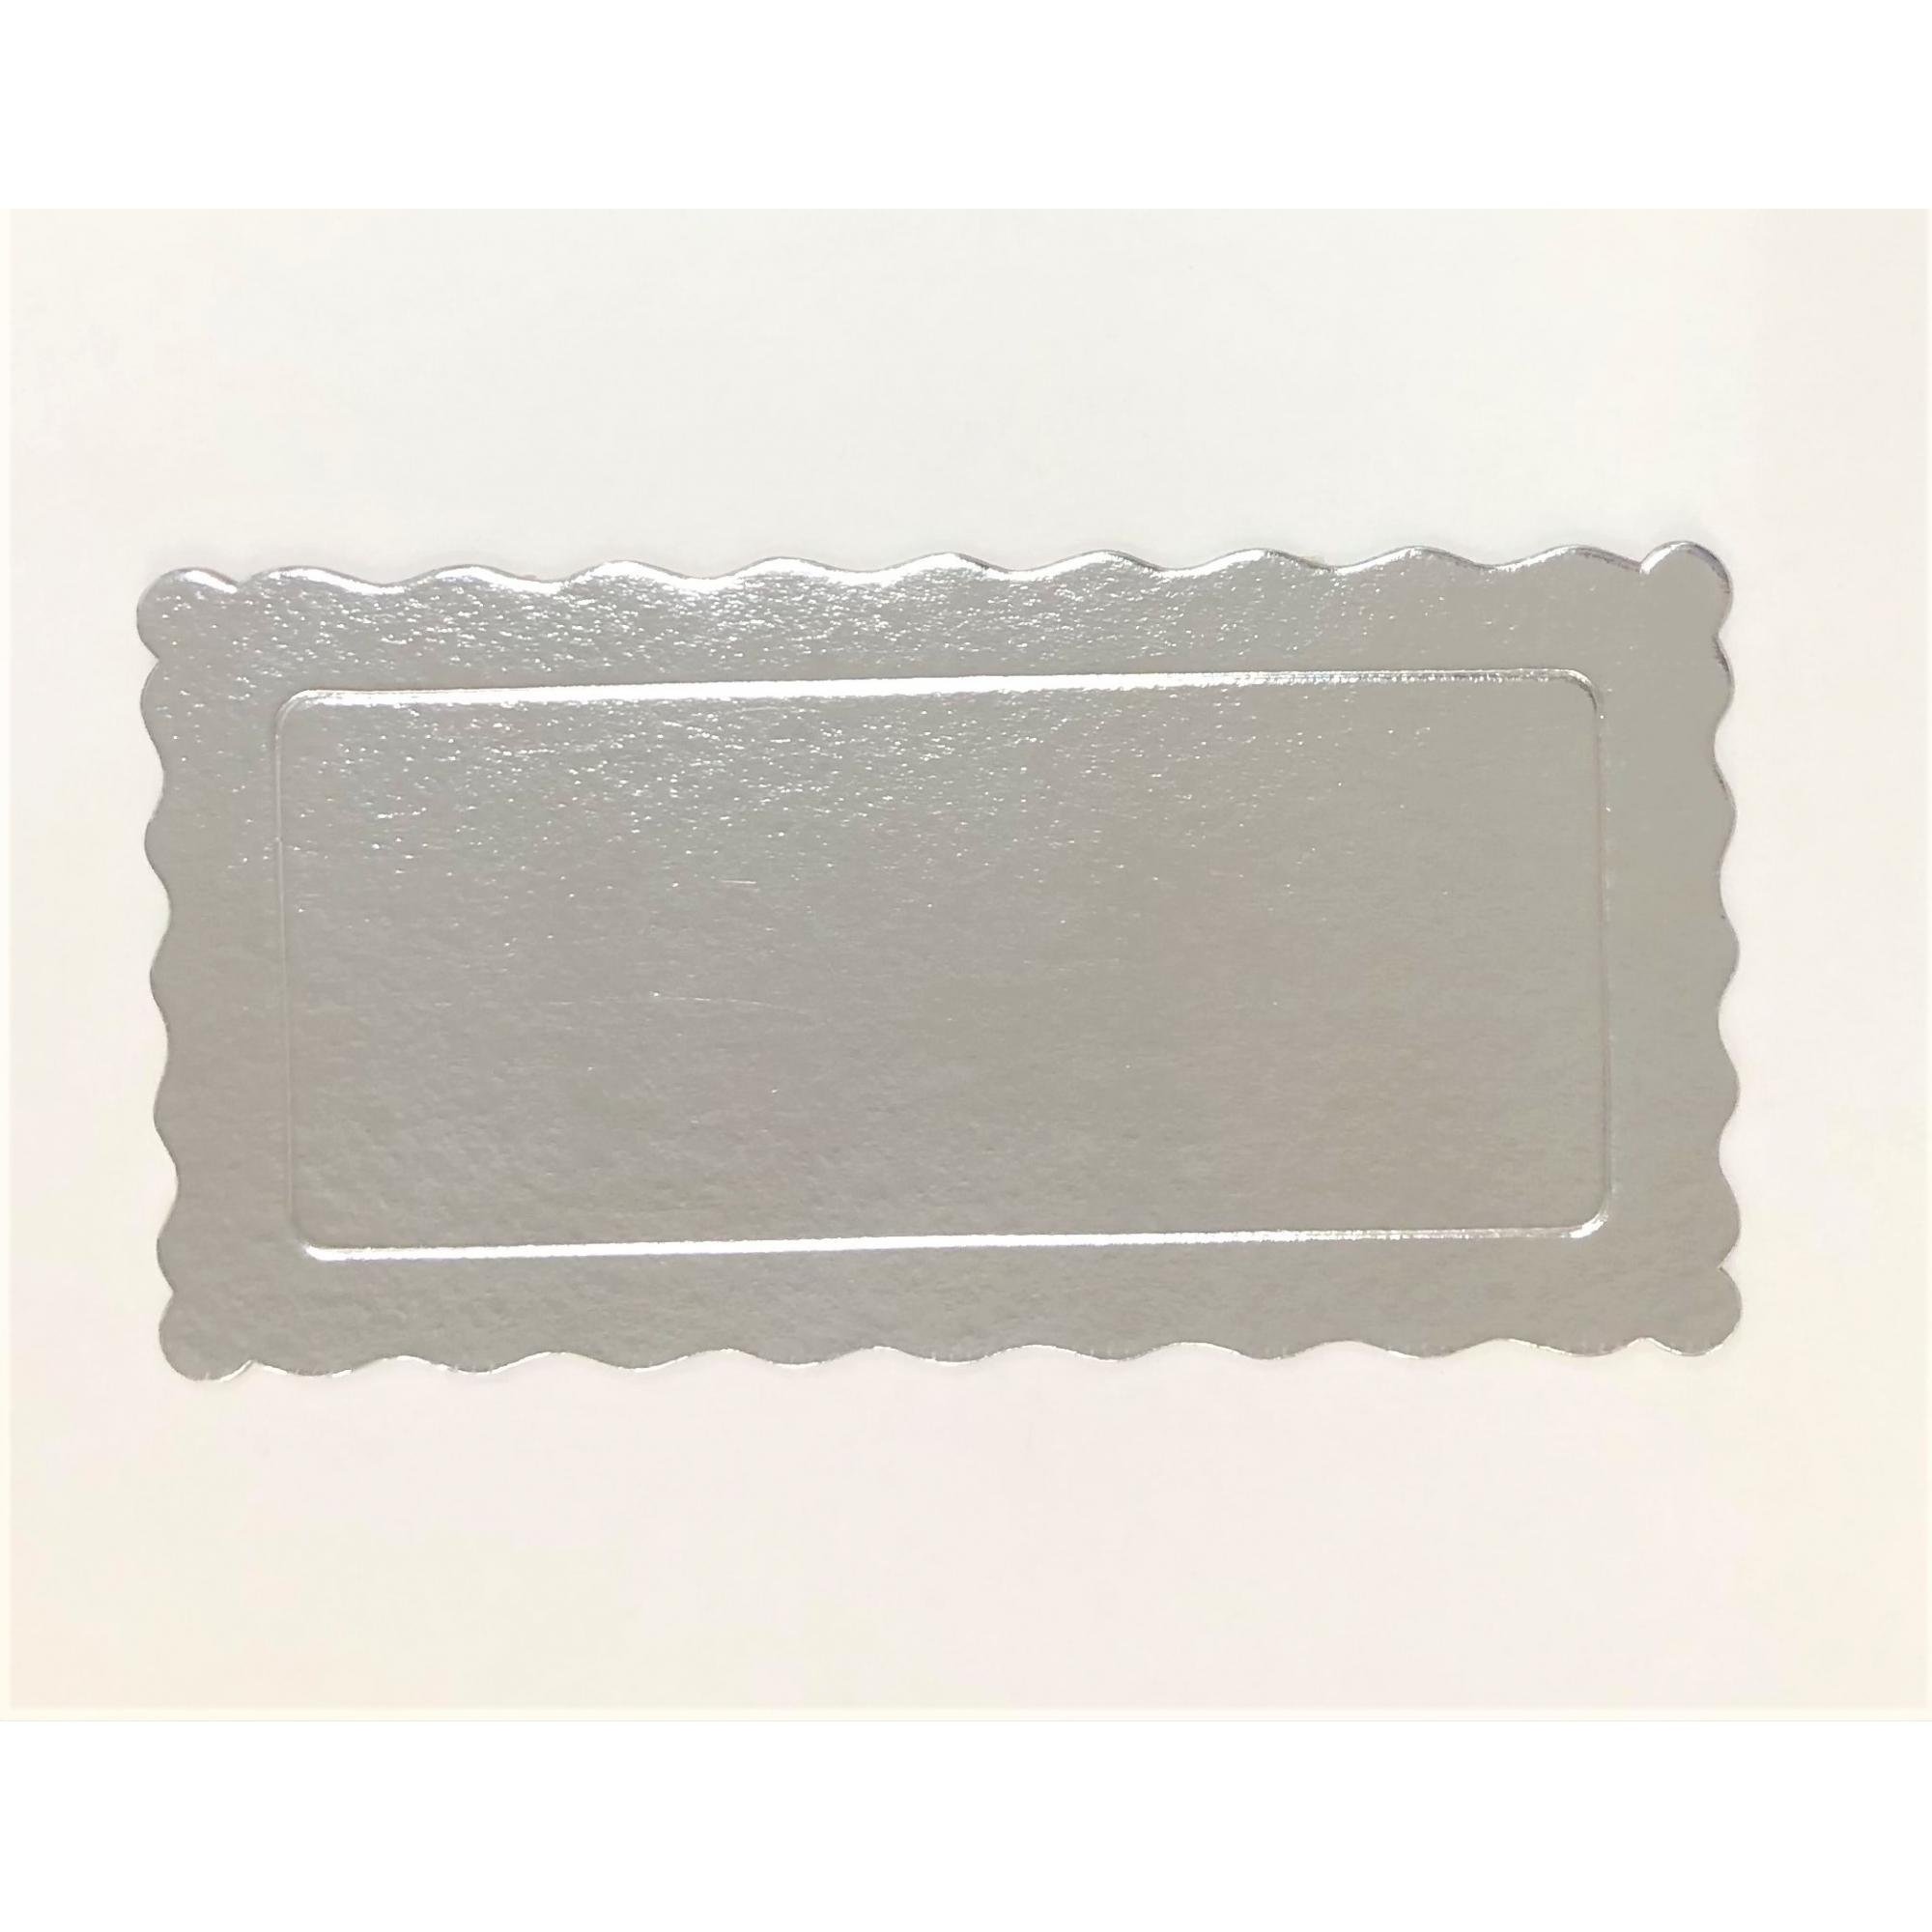 100 Bases Laminadas Para Bolo Retangular, Cake Board 29x15cm - Prata